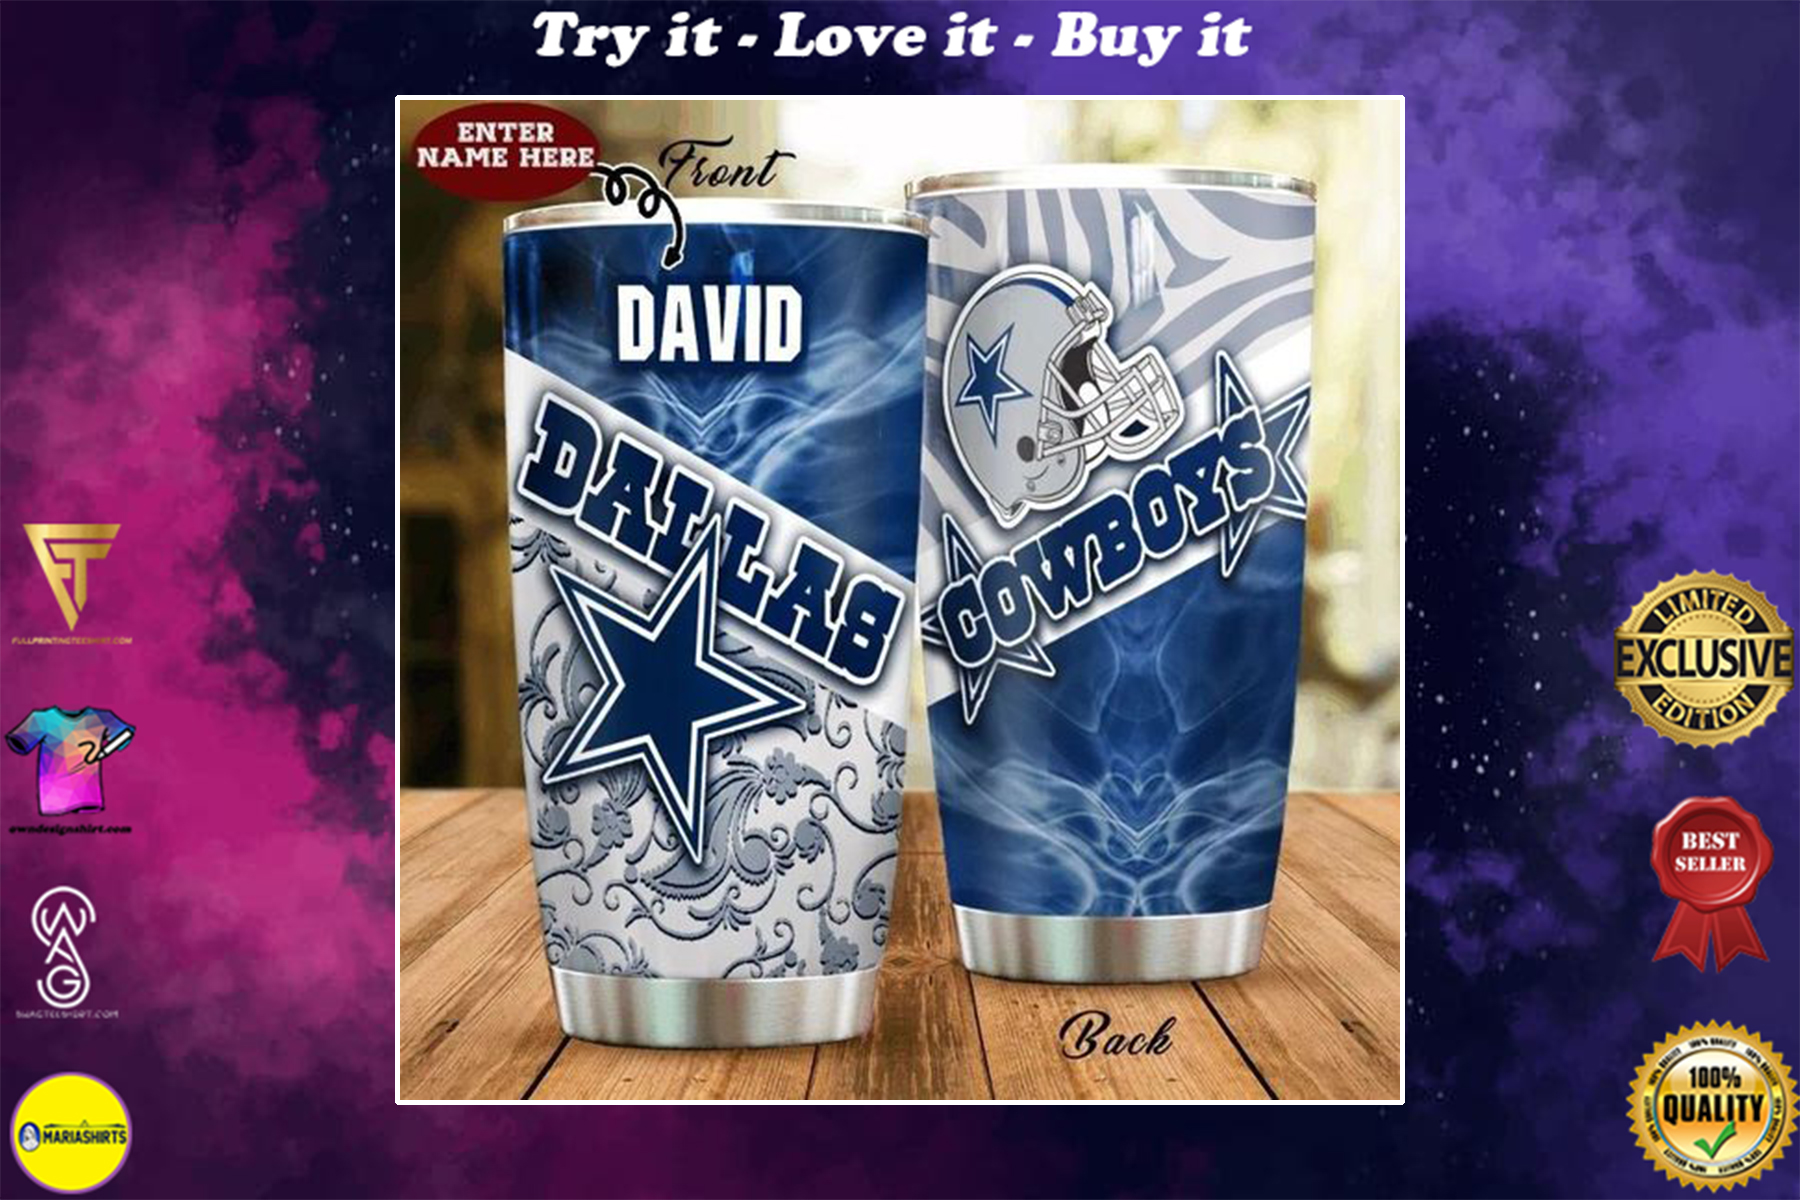 [special edition] custom name dallas cowboys american football team tumbler - maria